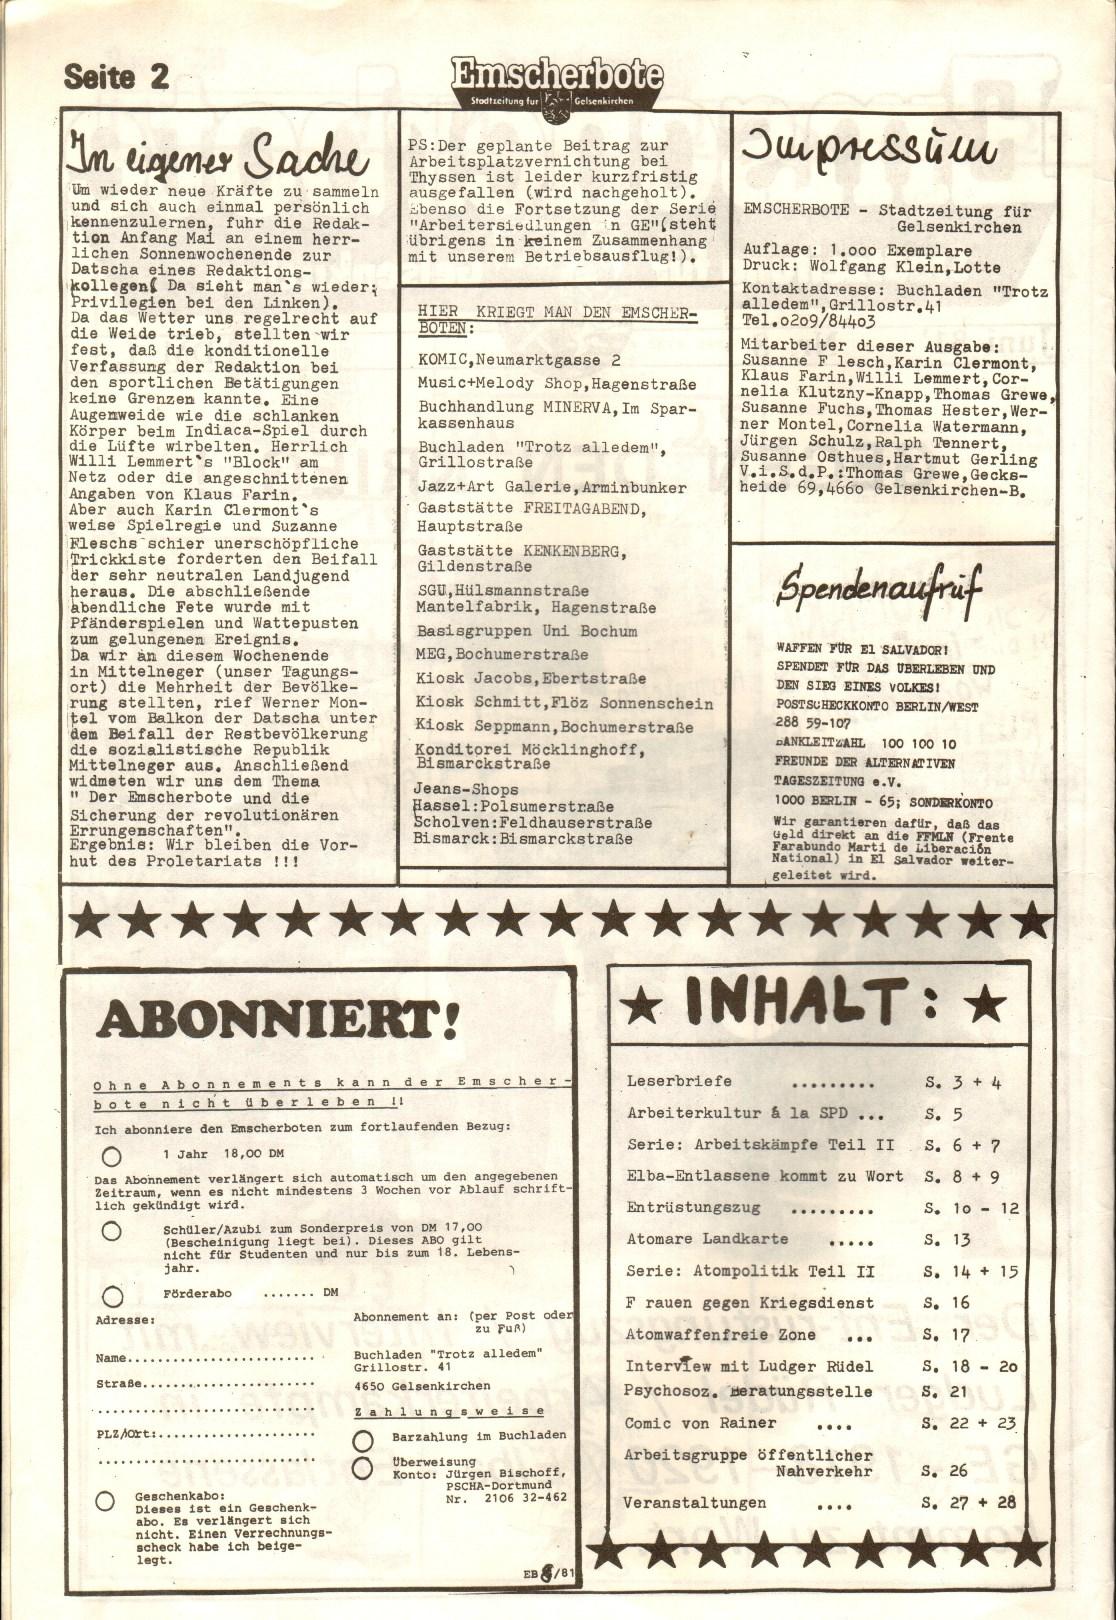 Gelsenkirchen_Emscherbote_1981_08_02